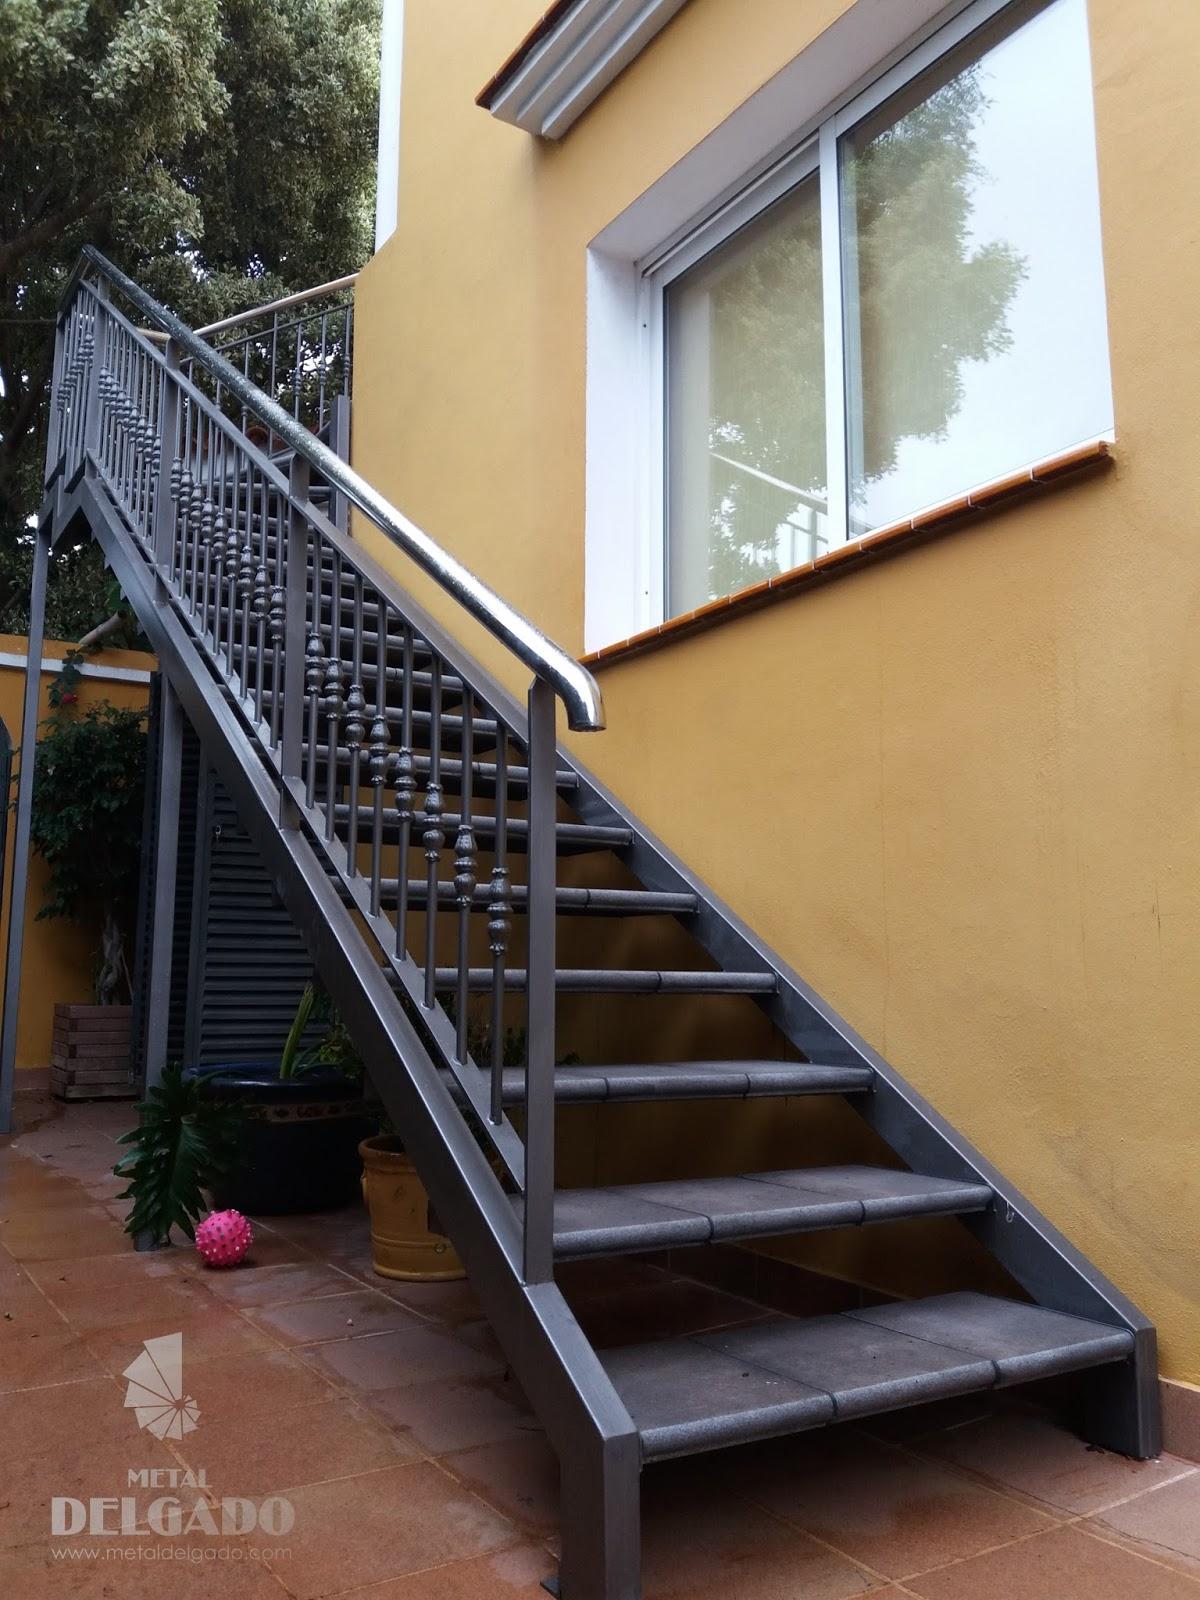 Acero inoxidable tenerife escaleras met licas tenerife for Gradas metalicas para casas